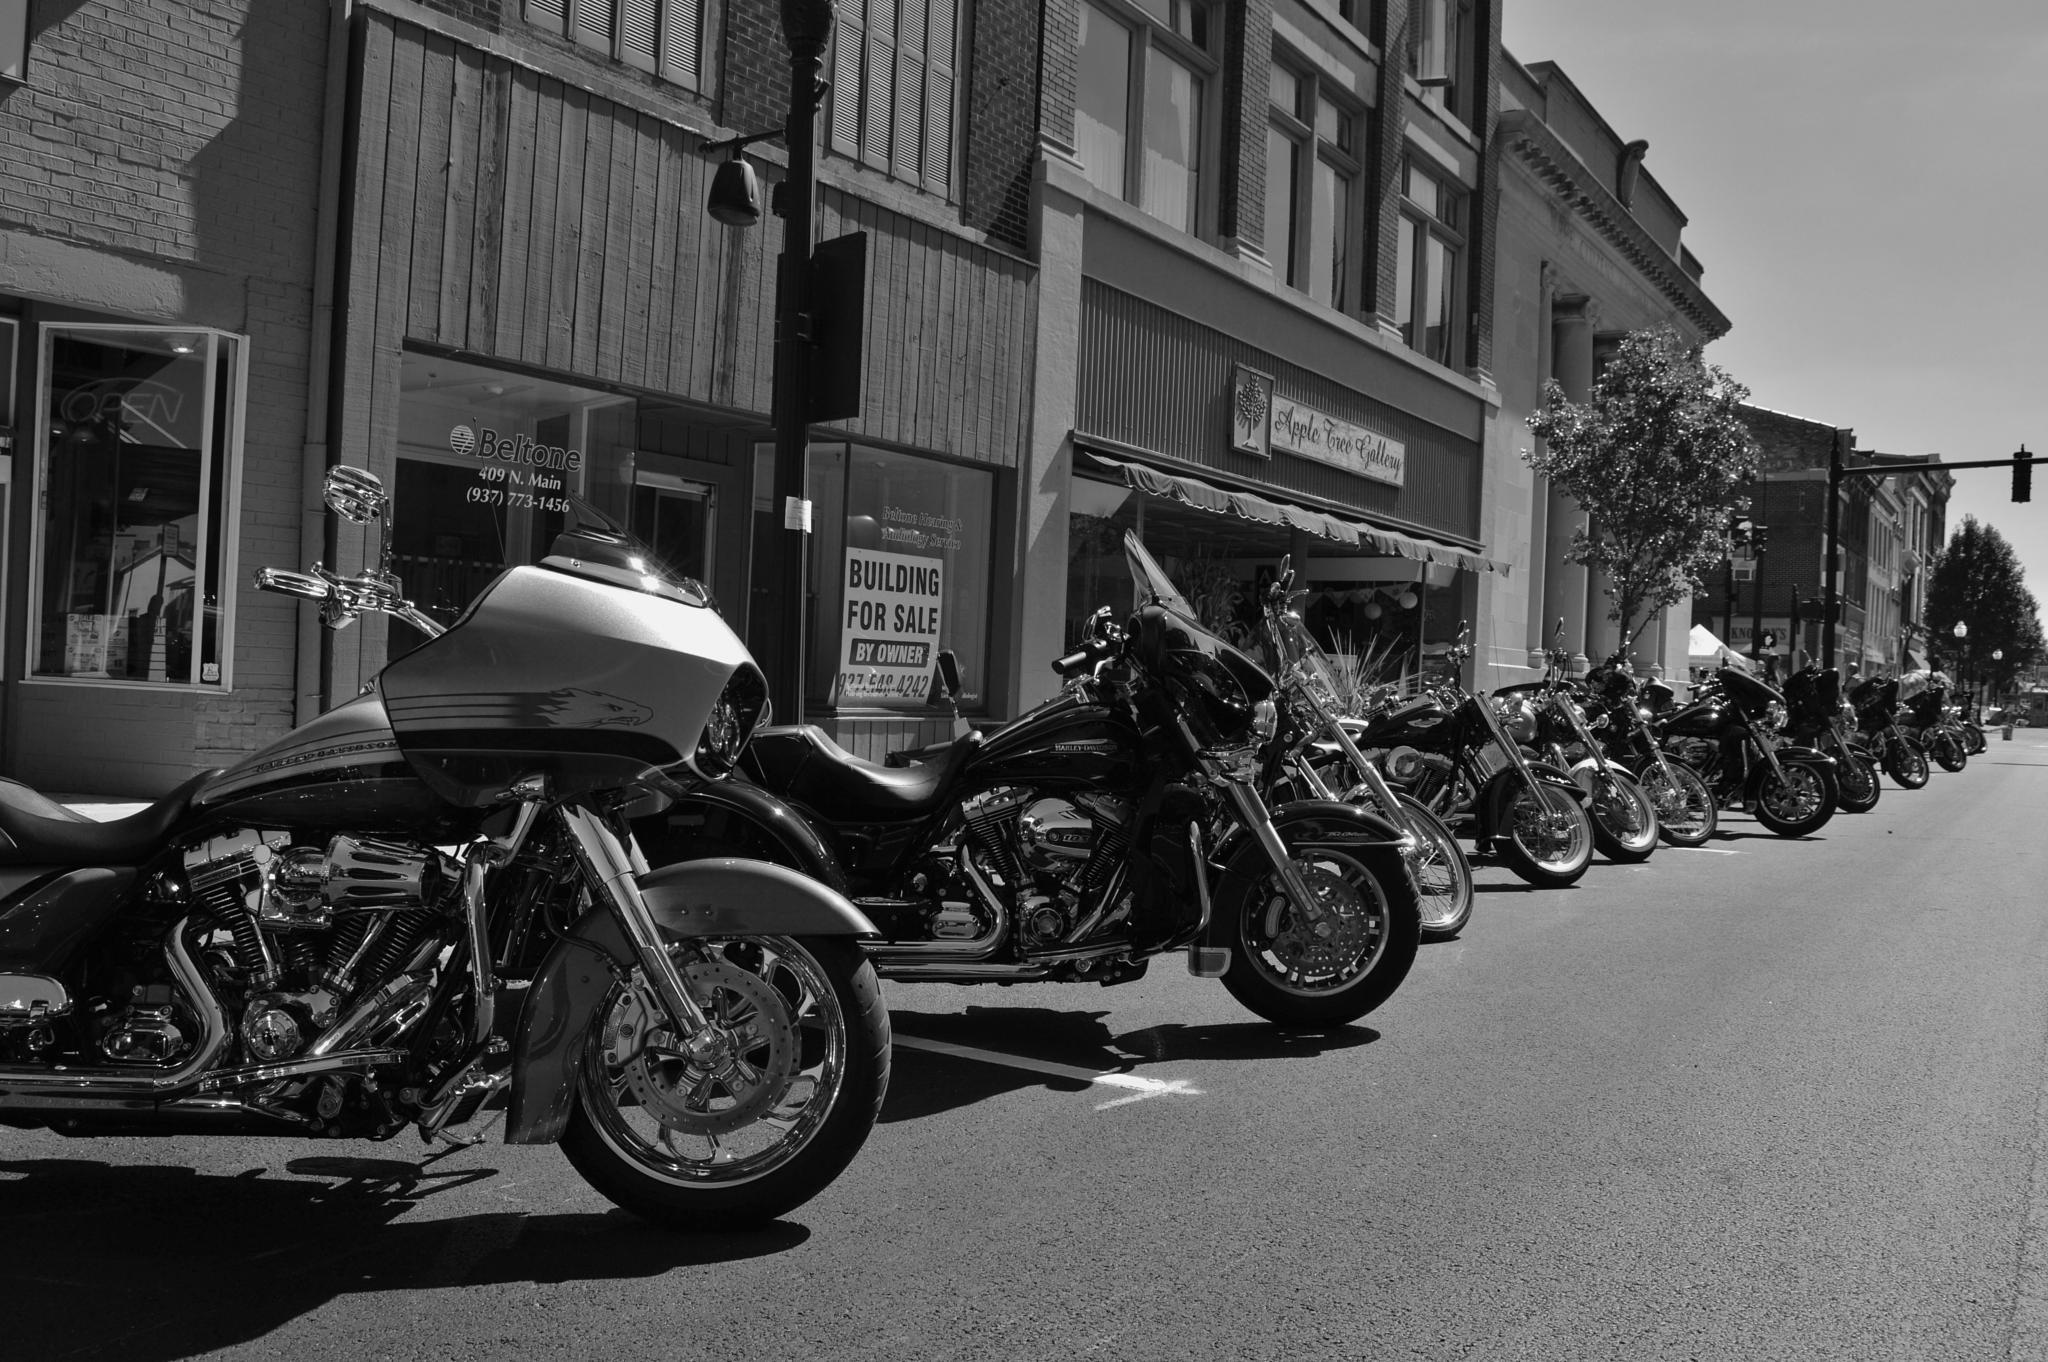 Bike Fest 2014 by Doug Fosnight